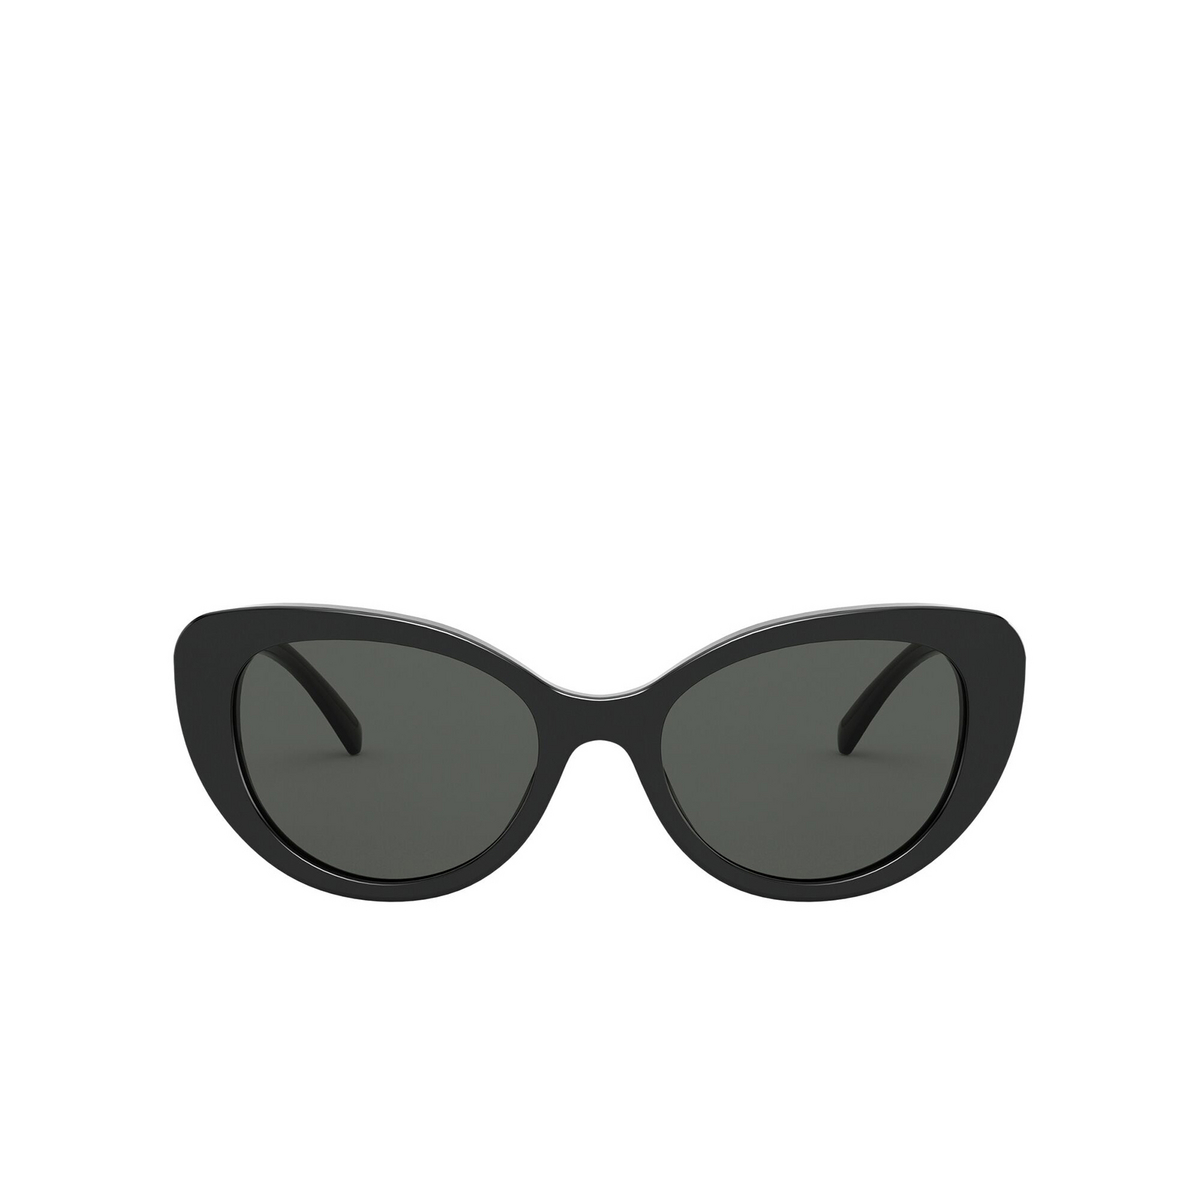 Versace® Cat-eye Sunglasses: VE4378 color Black GB1/87 - front view.